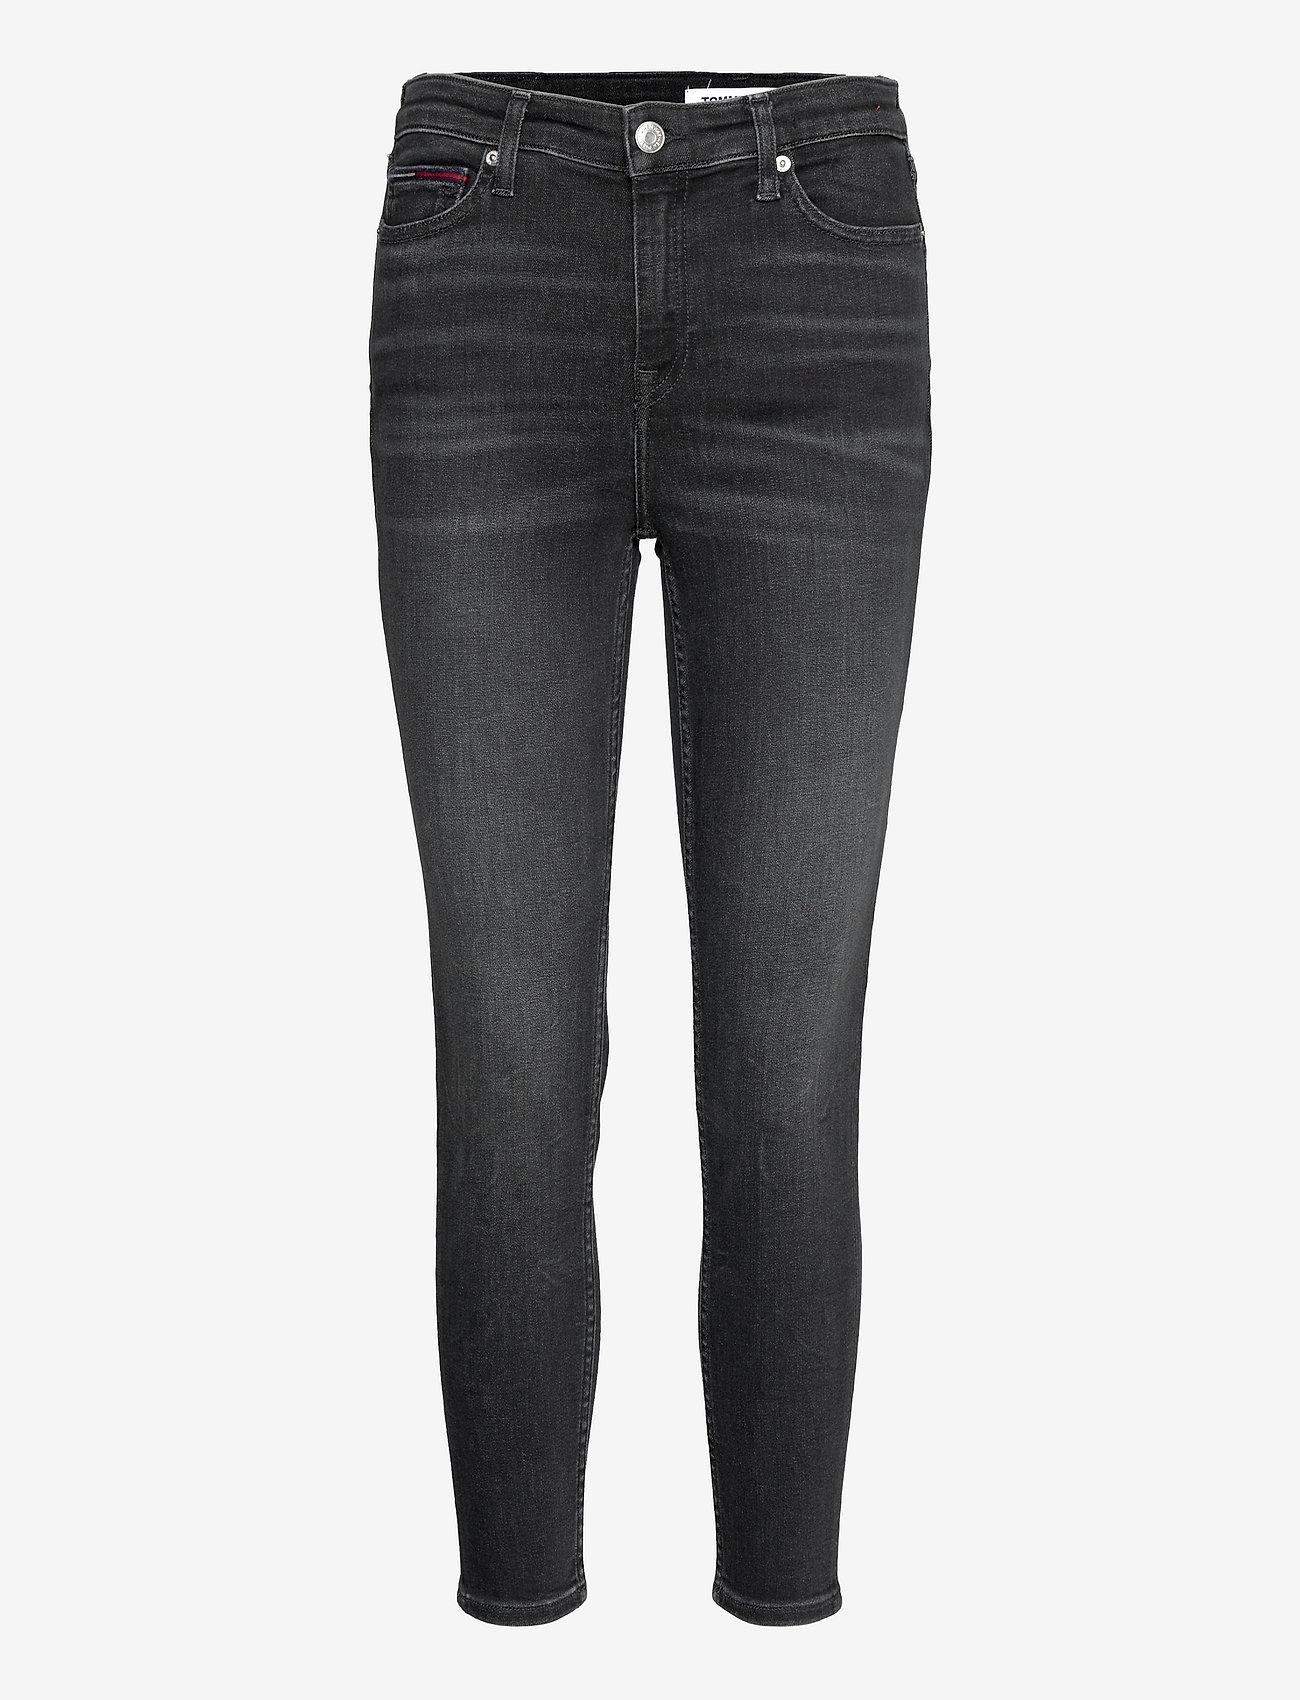 Tommy Jeans - NORA MR SKNY ANKLE AE170 BKS - skinny jeans - denim black - 0